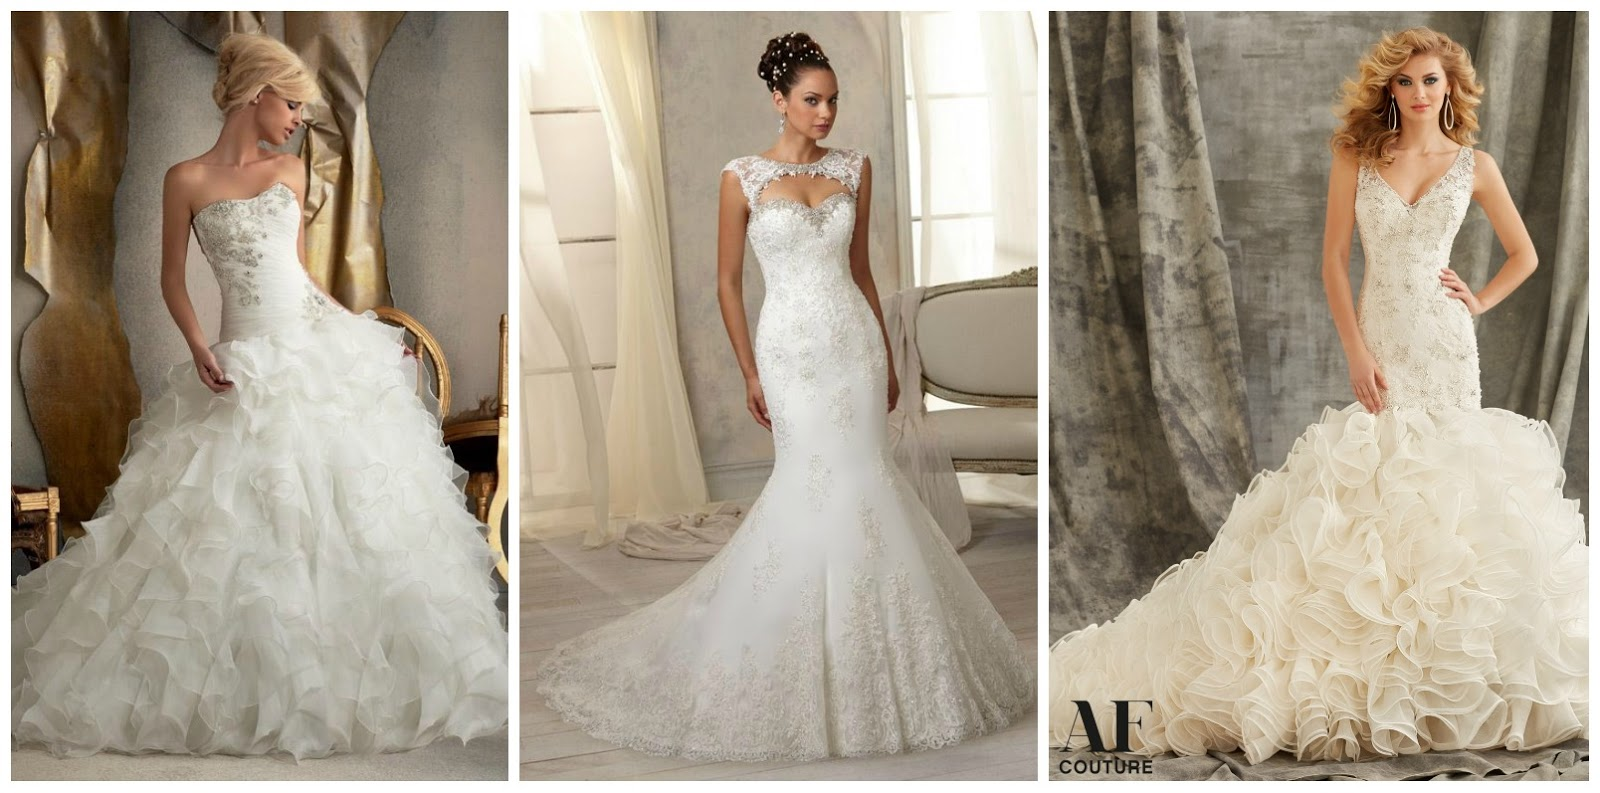 Brides of America Online Store: December 2015